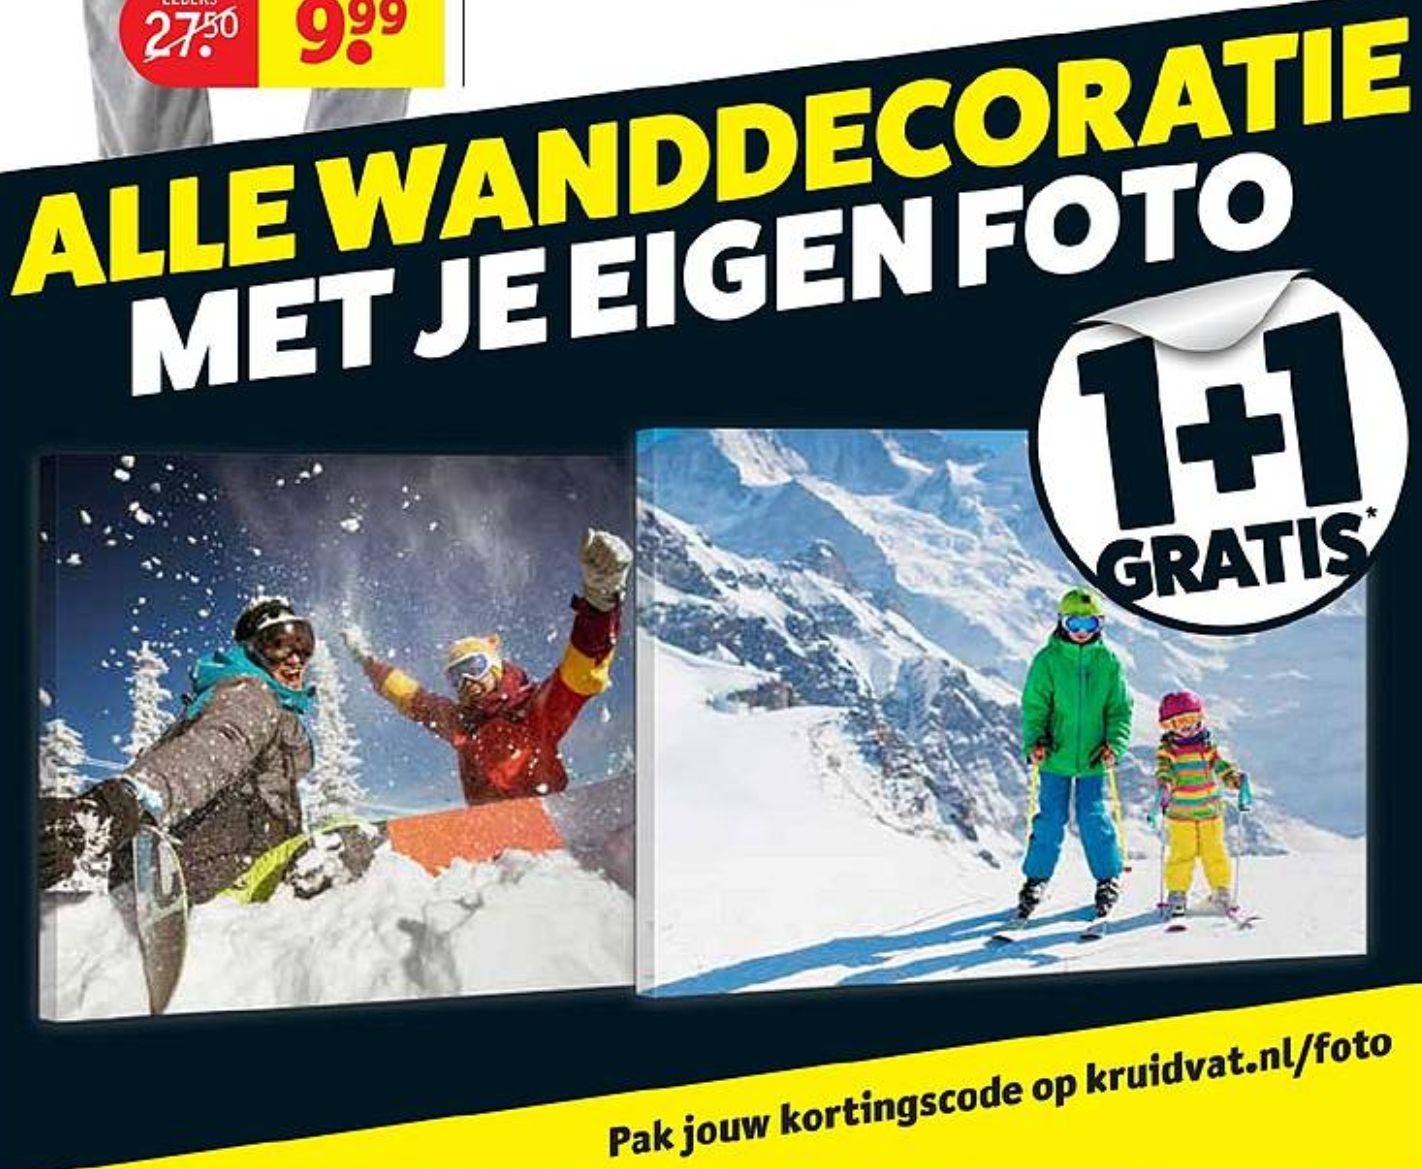 1+1 gratis op alle wanddecoratie met je eigen foto @Kruidvat